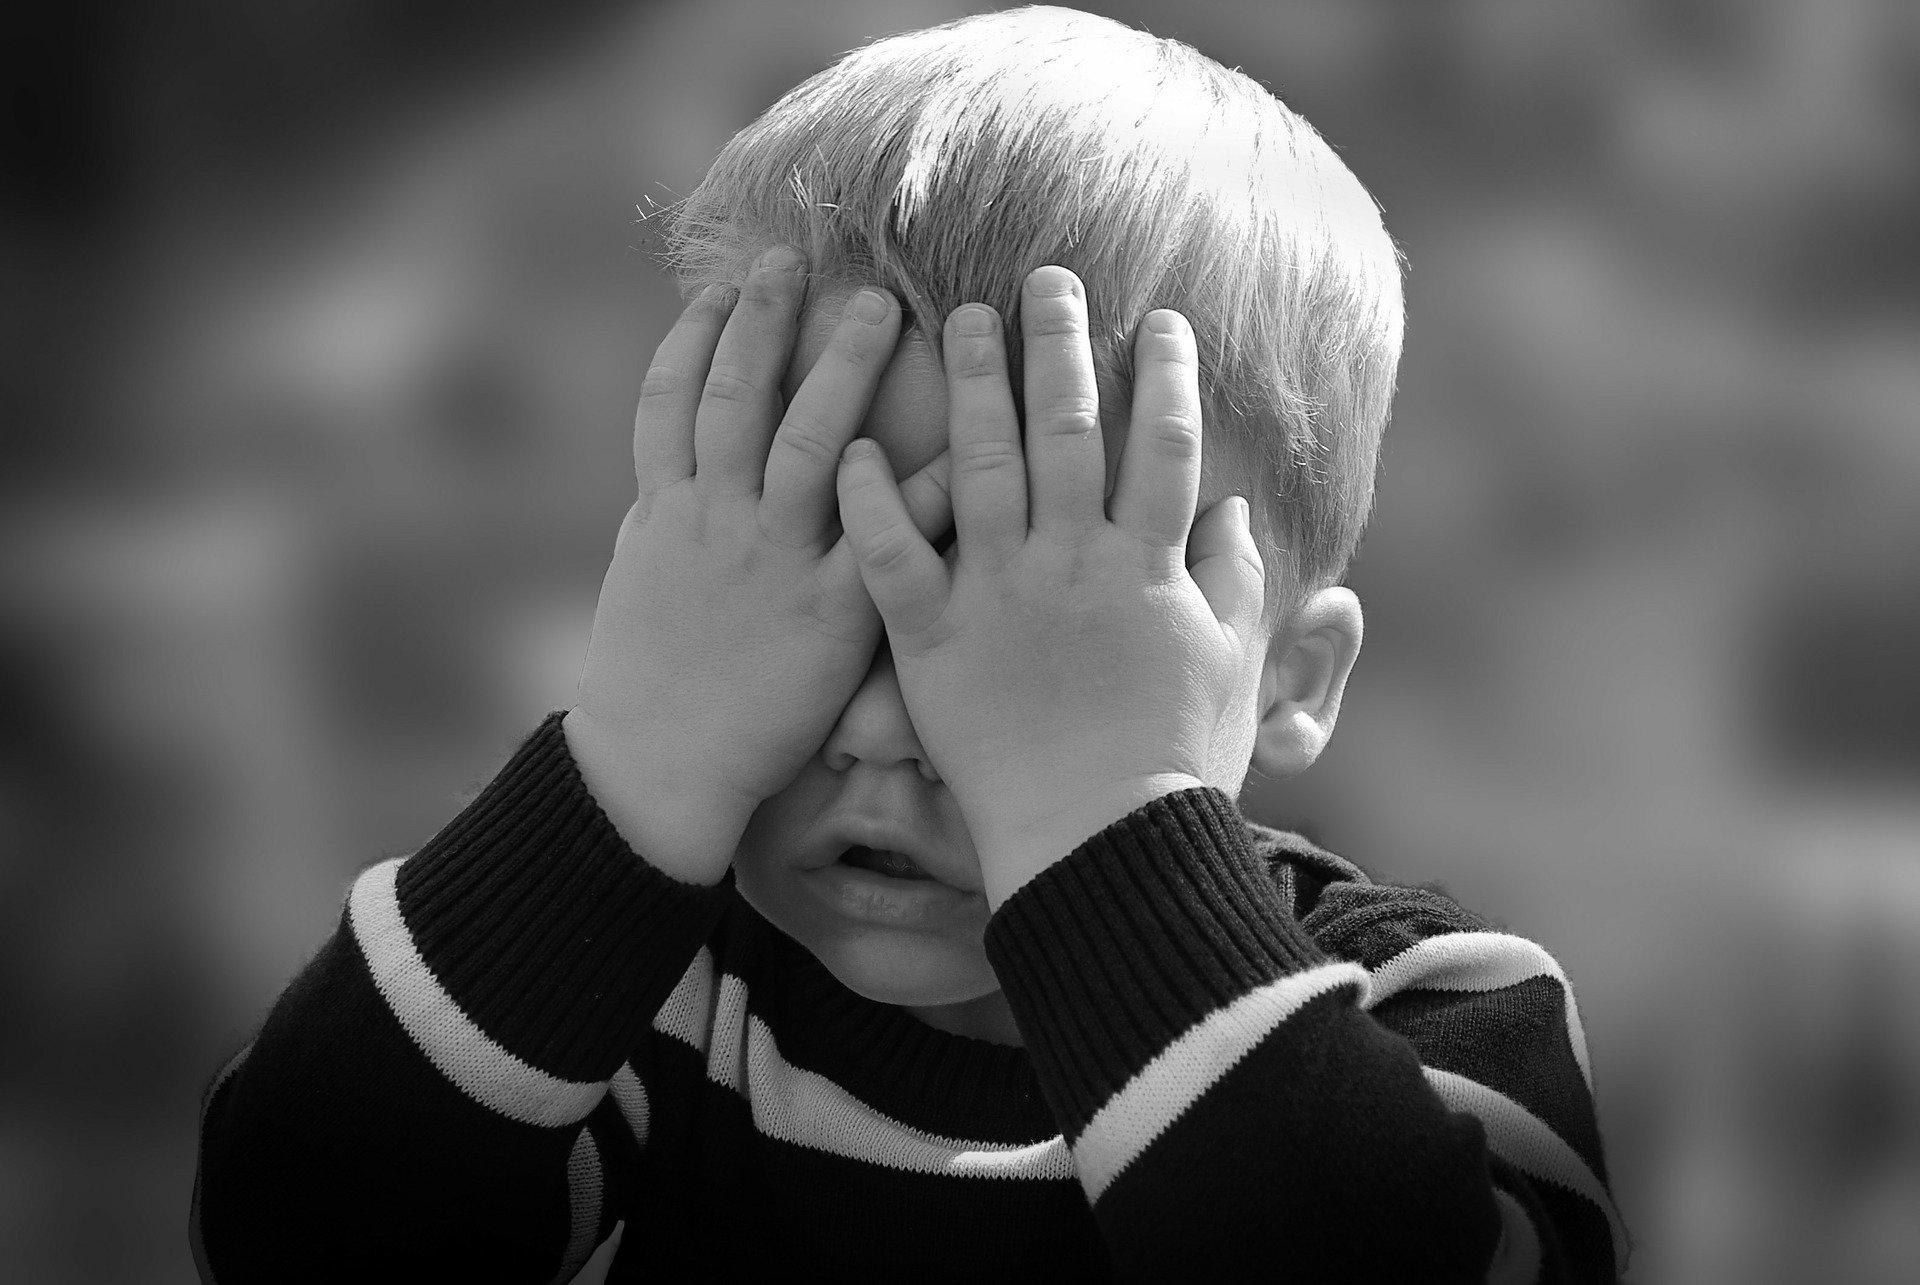 Photo of ילד בן 5 שנחנק מסוכריה בביתו בבני ברק הוכנס לחדר ניתוח